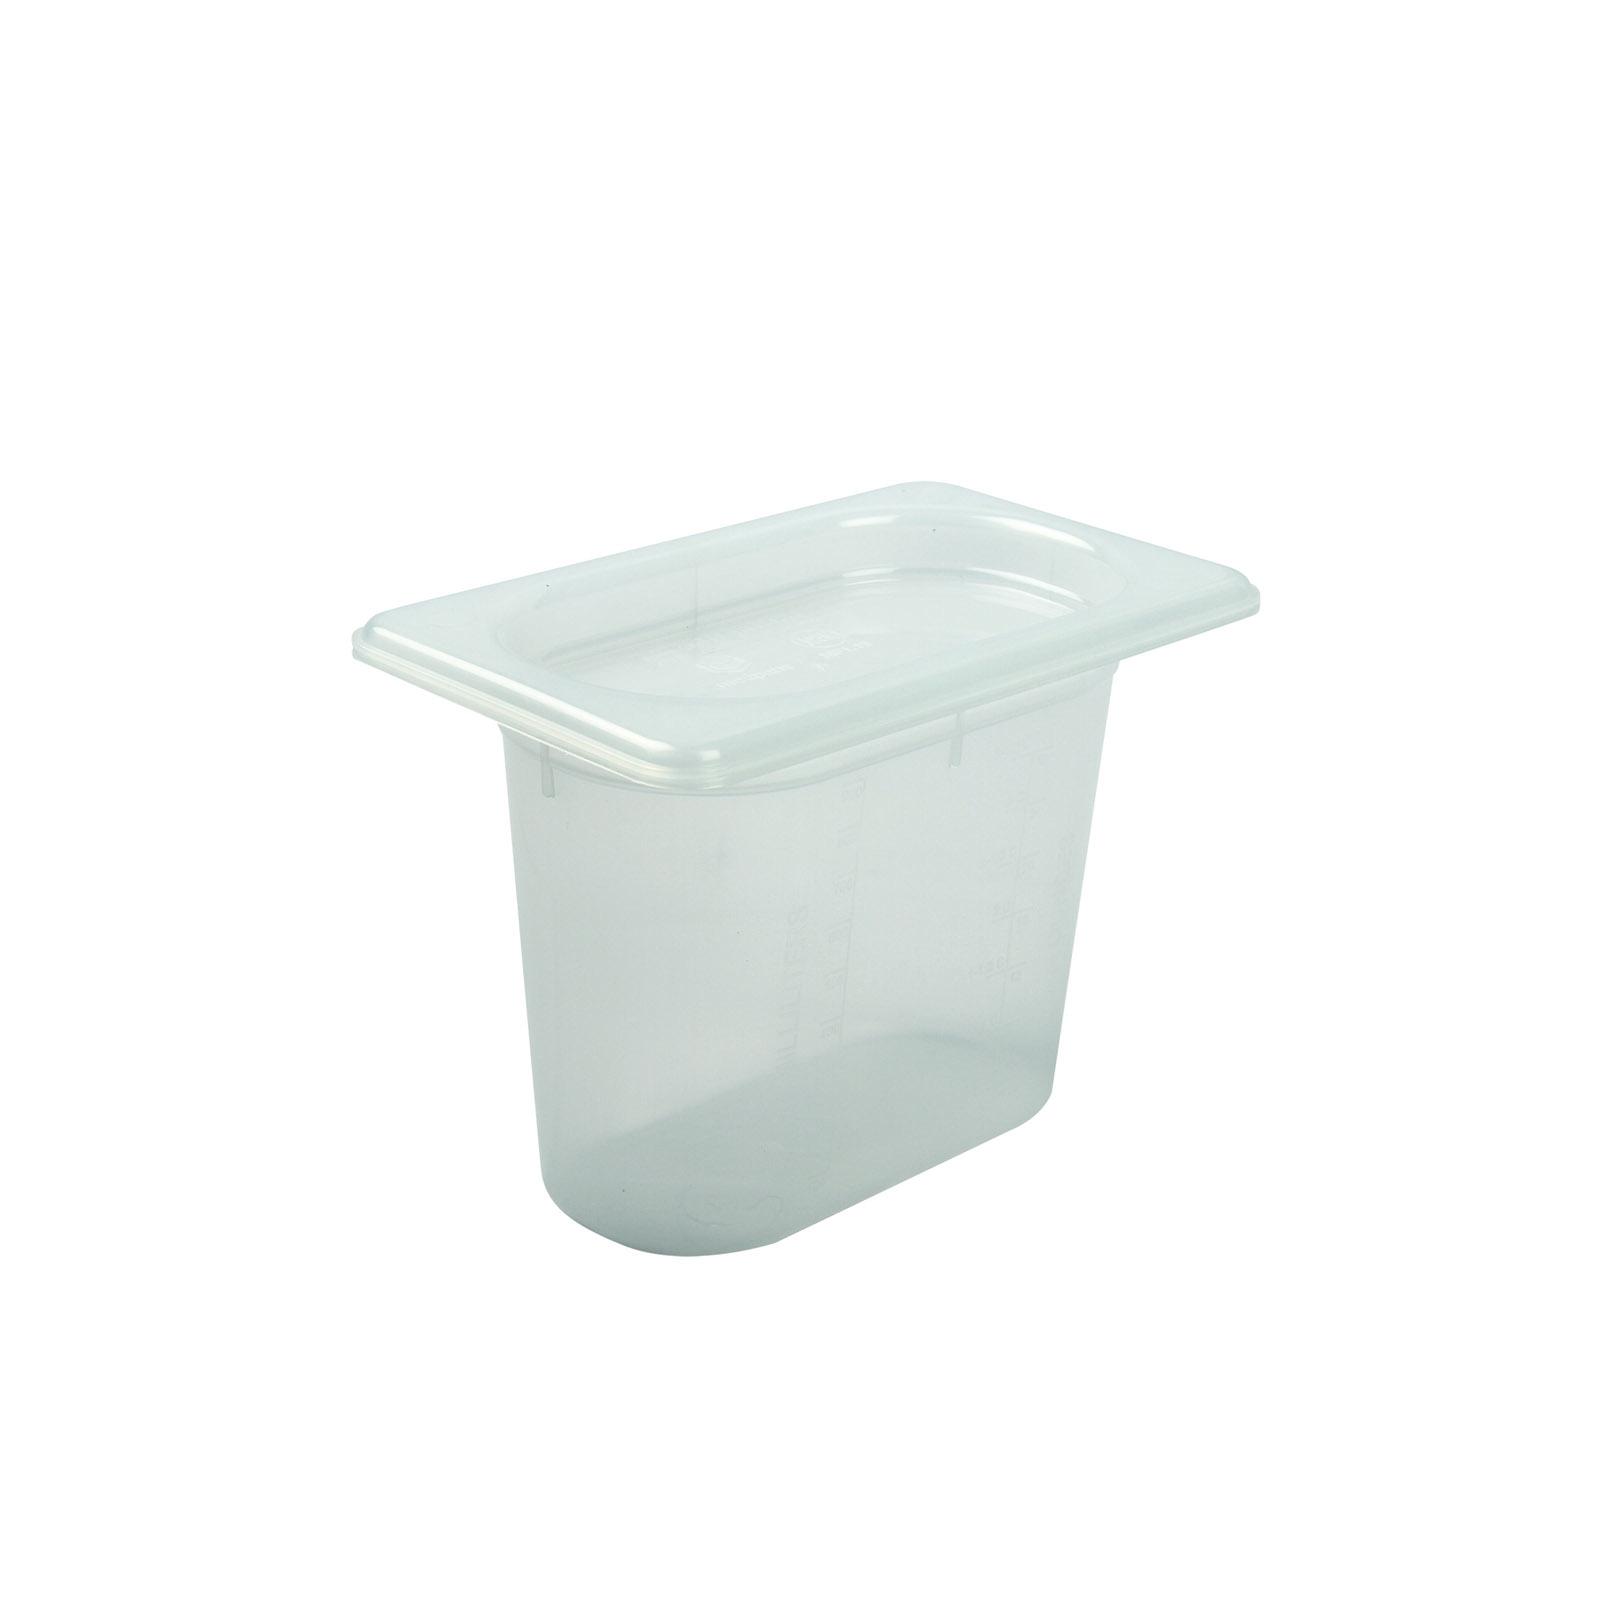 San Jamar MP19 food pan, plastic